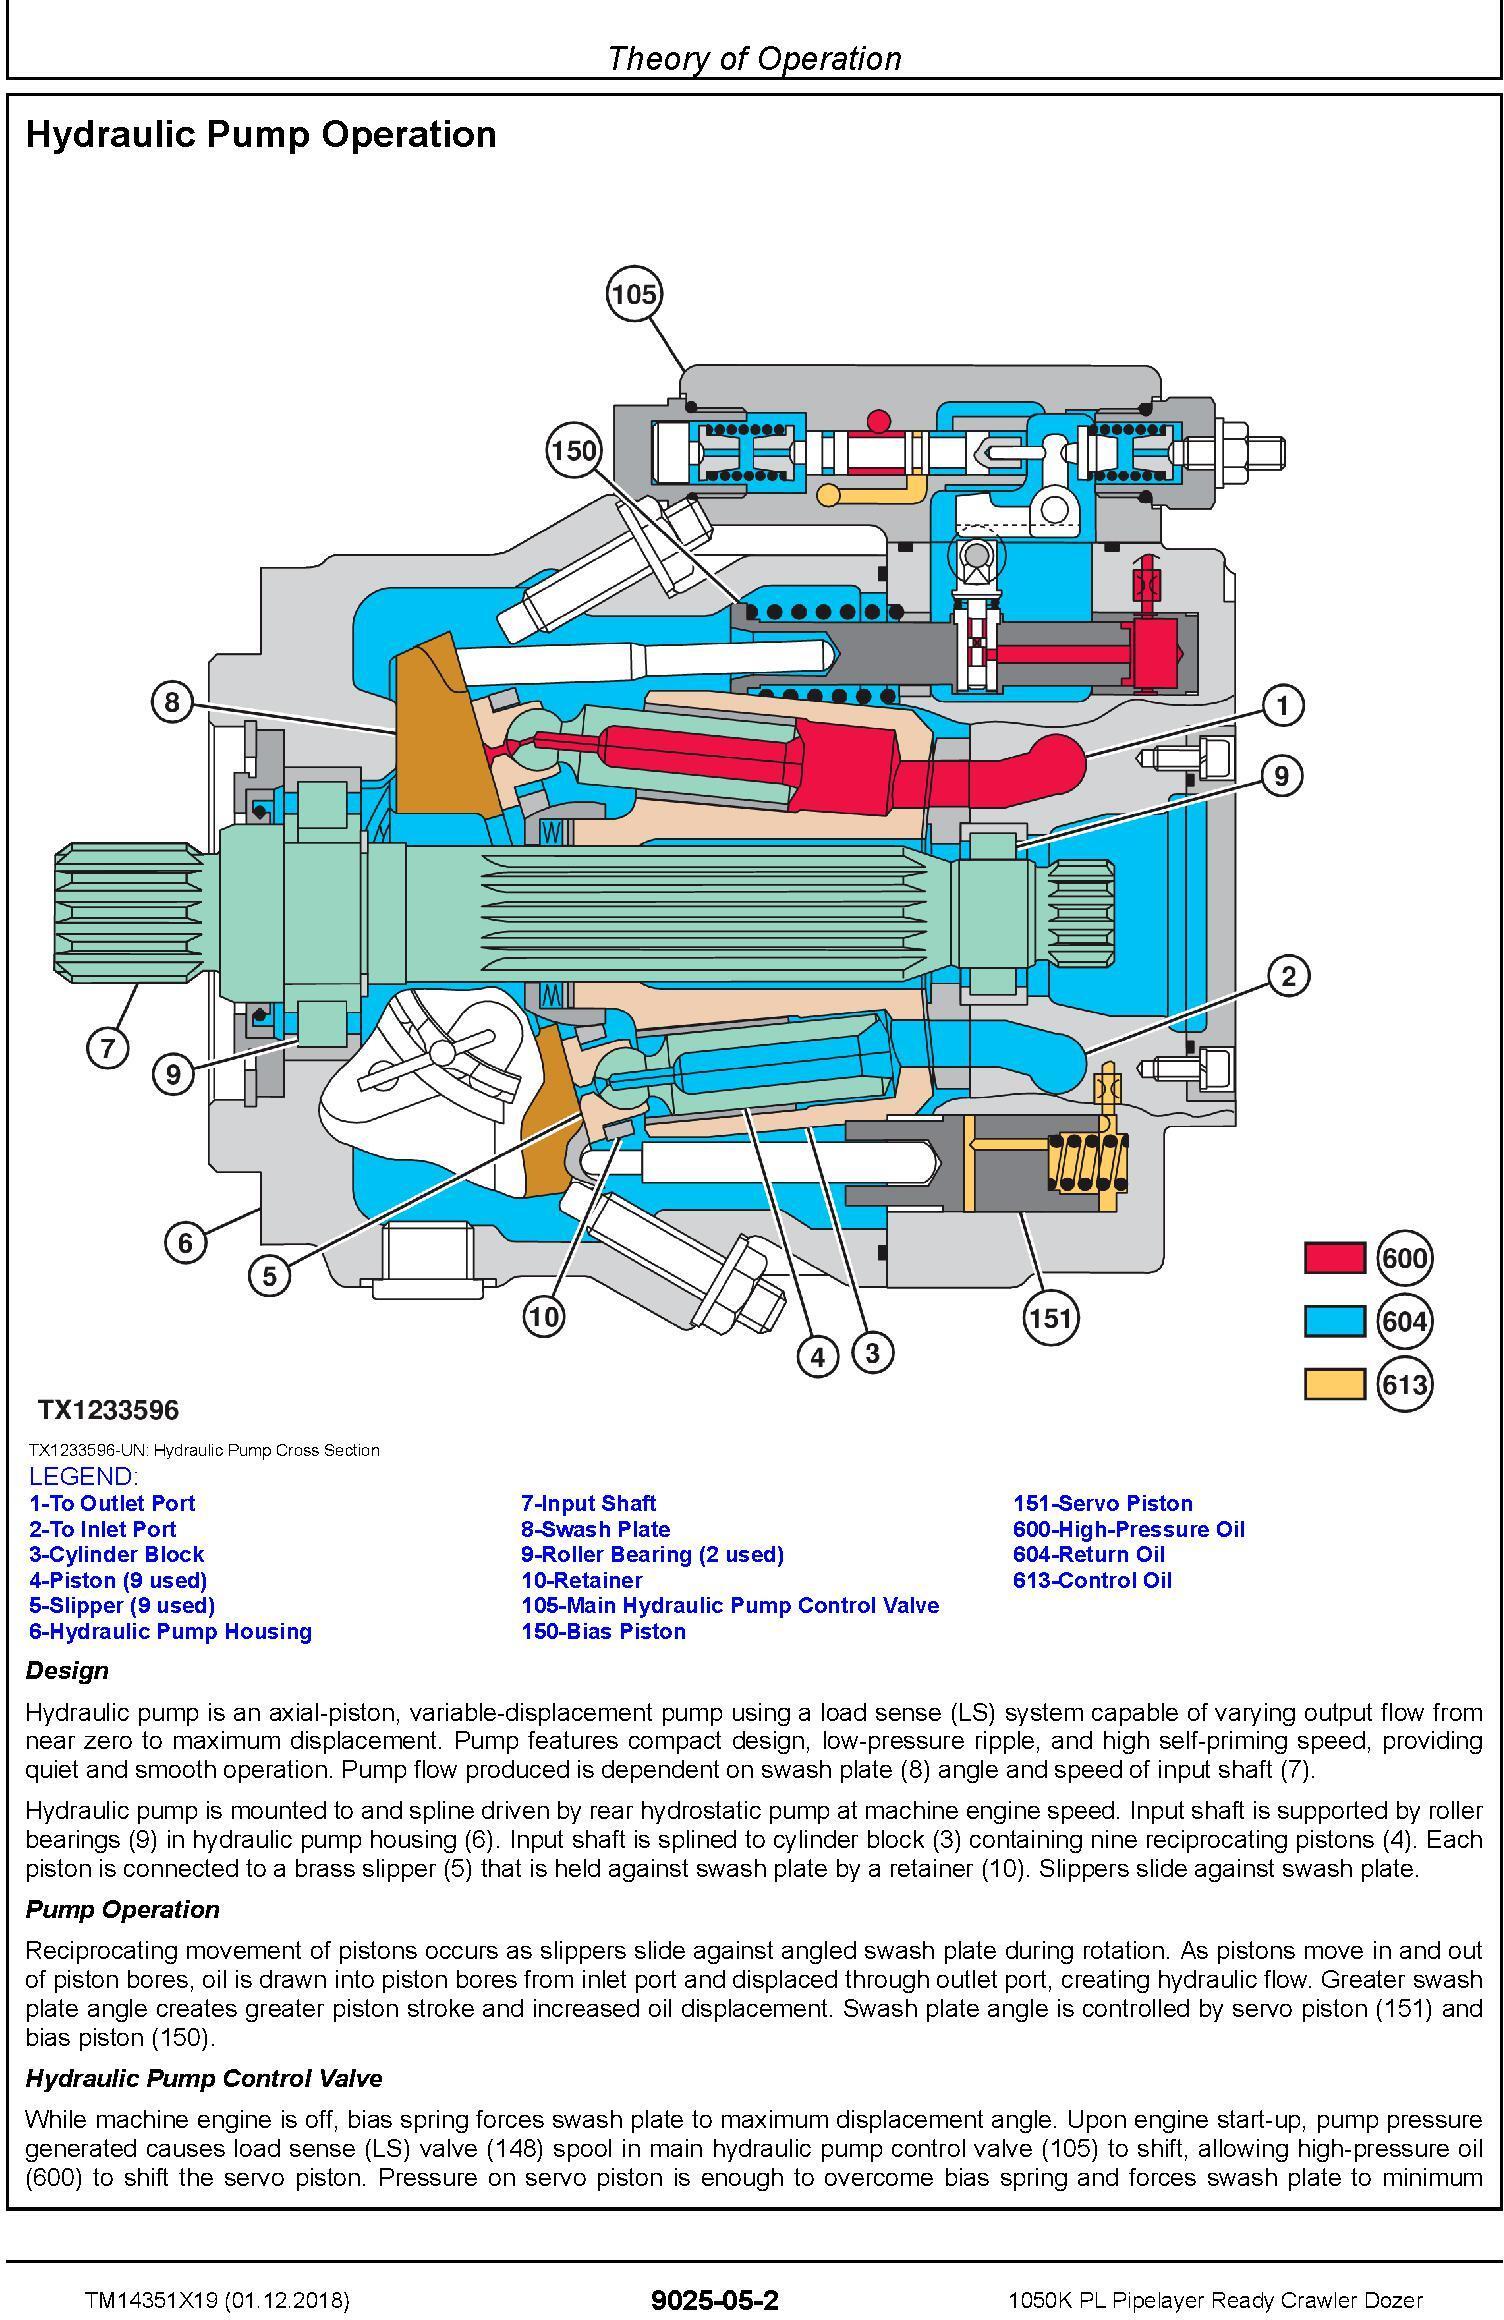 John Deere 1050K PL (SN. F318802-) Pipelayer Ready Crawler Dozer Diagnostic Manual (TM14351X19) - 3